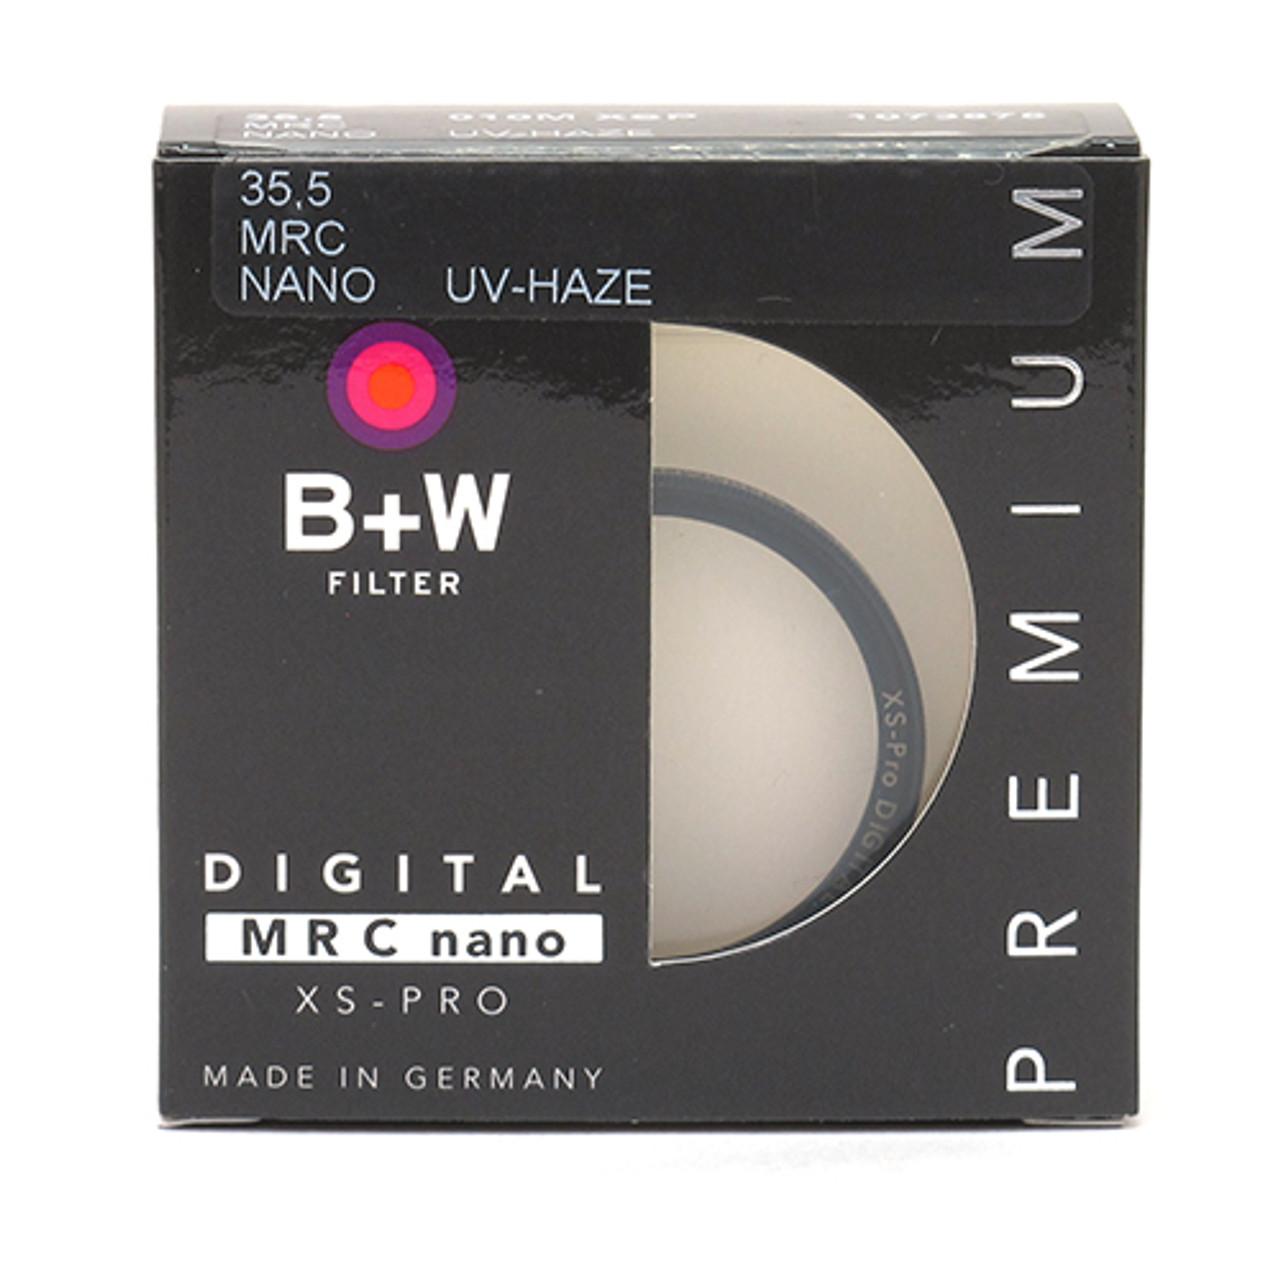 B+W XS-PRO UV HAZE MRC-NANO